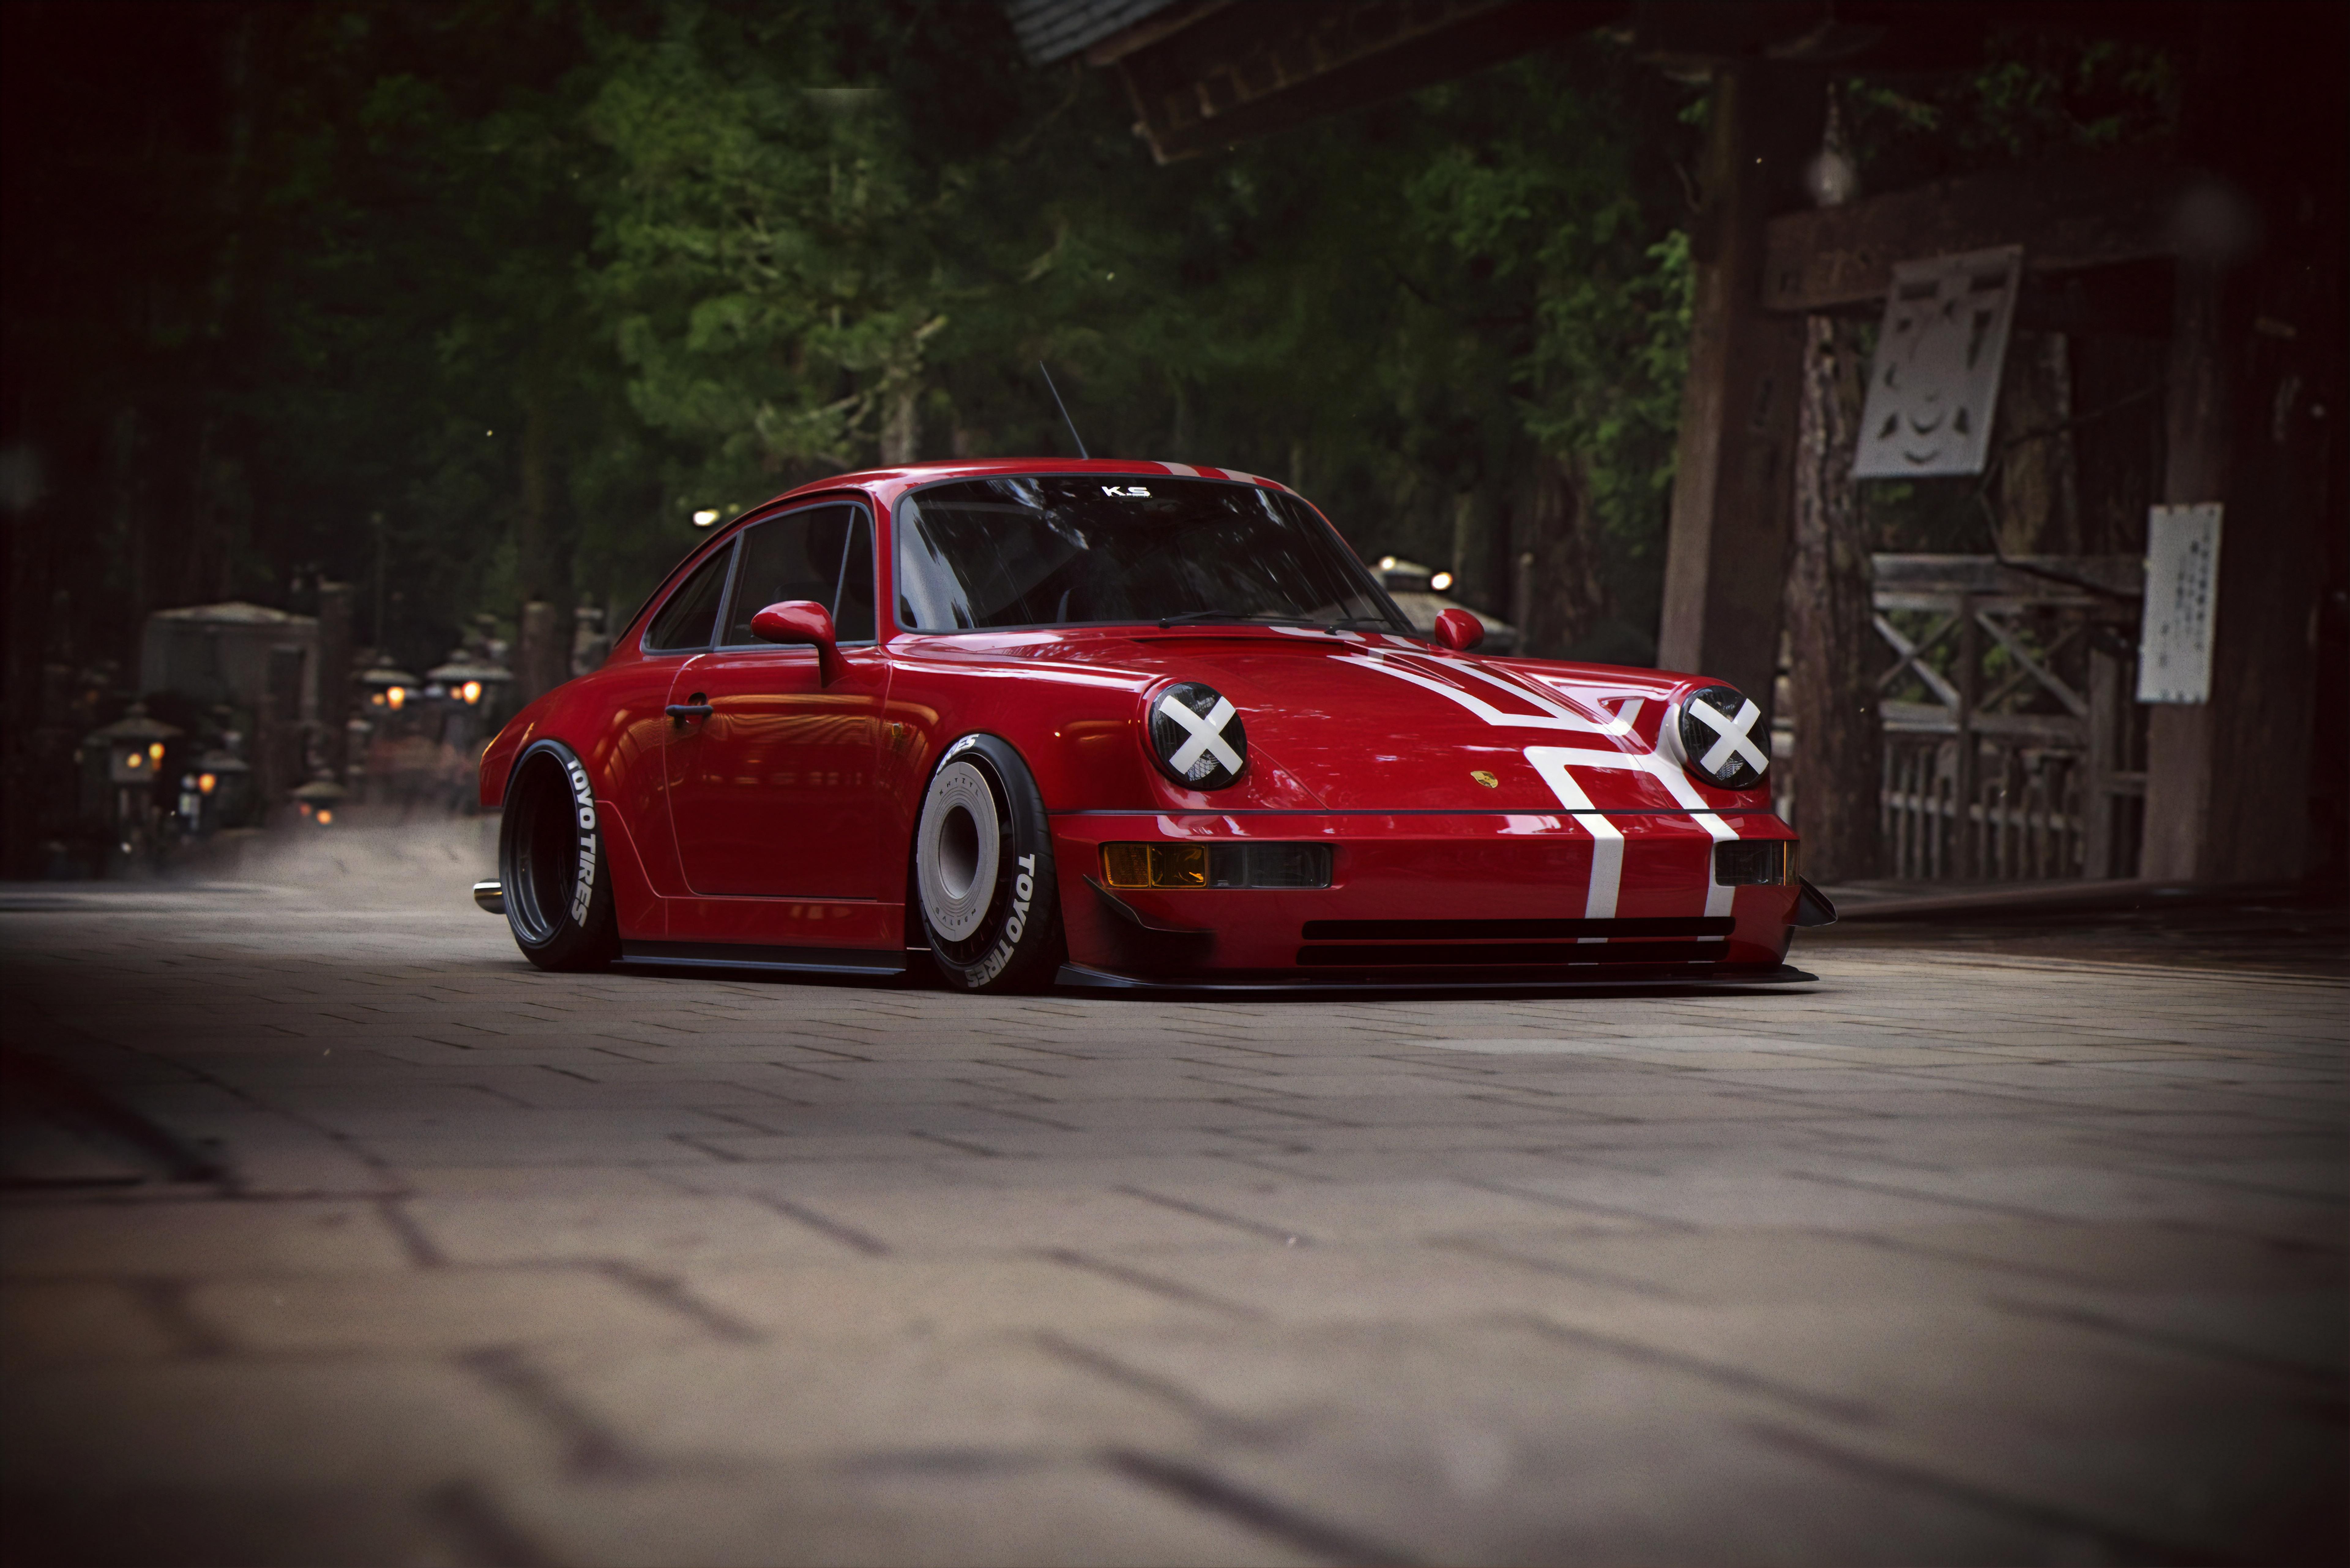 Porsche Toyo 8k, HD Cars, 4k Wallpapers, Images ...